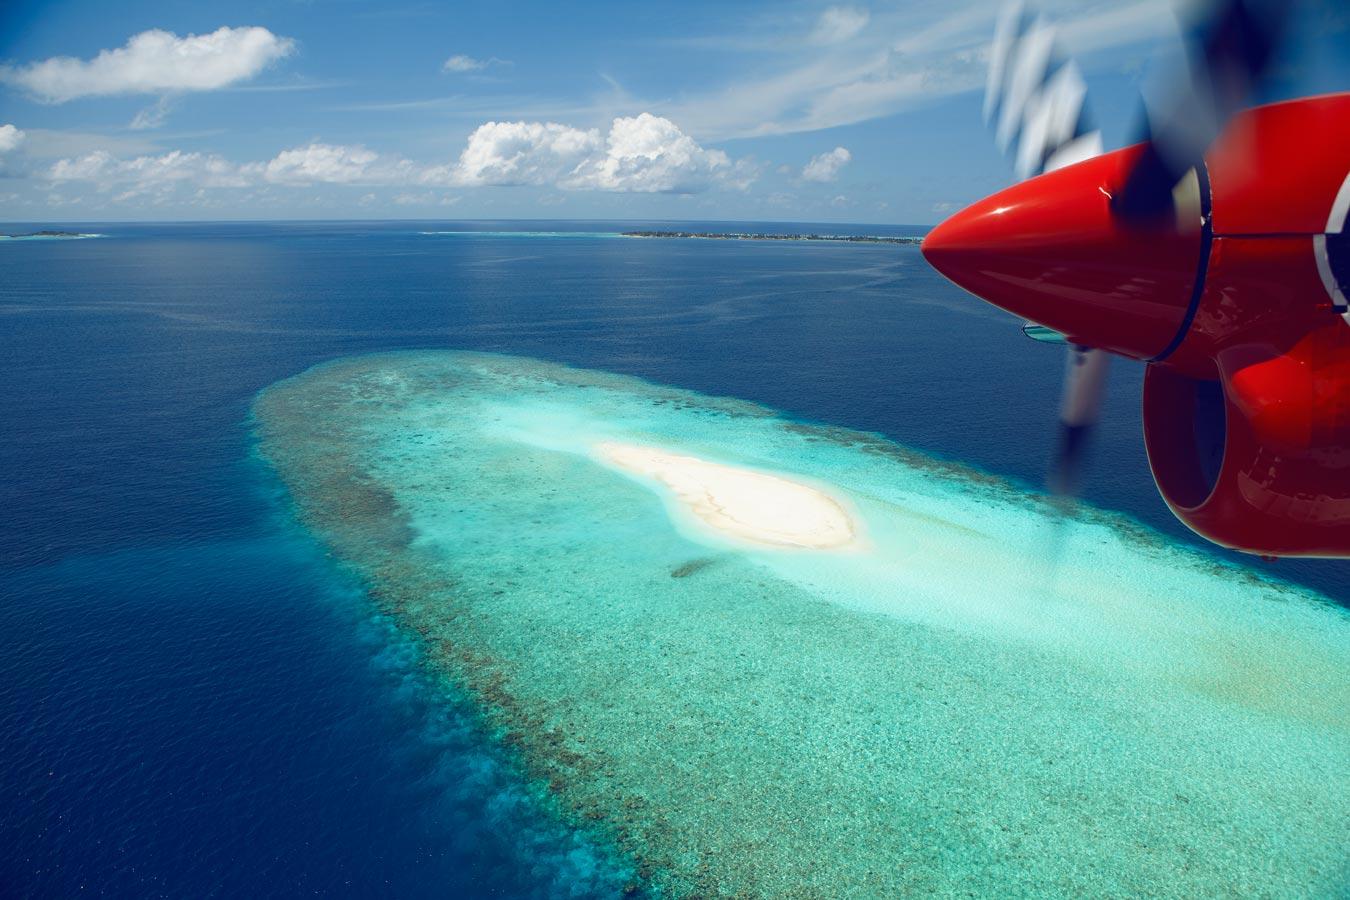 Maldives Island Excursions | Seaplane Photo Flight Image | Kurumba Maldives